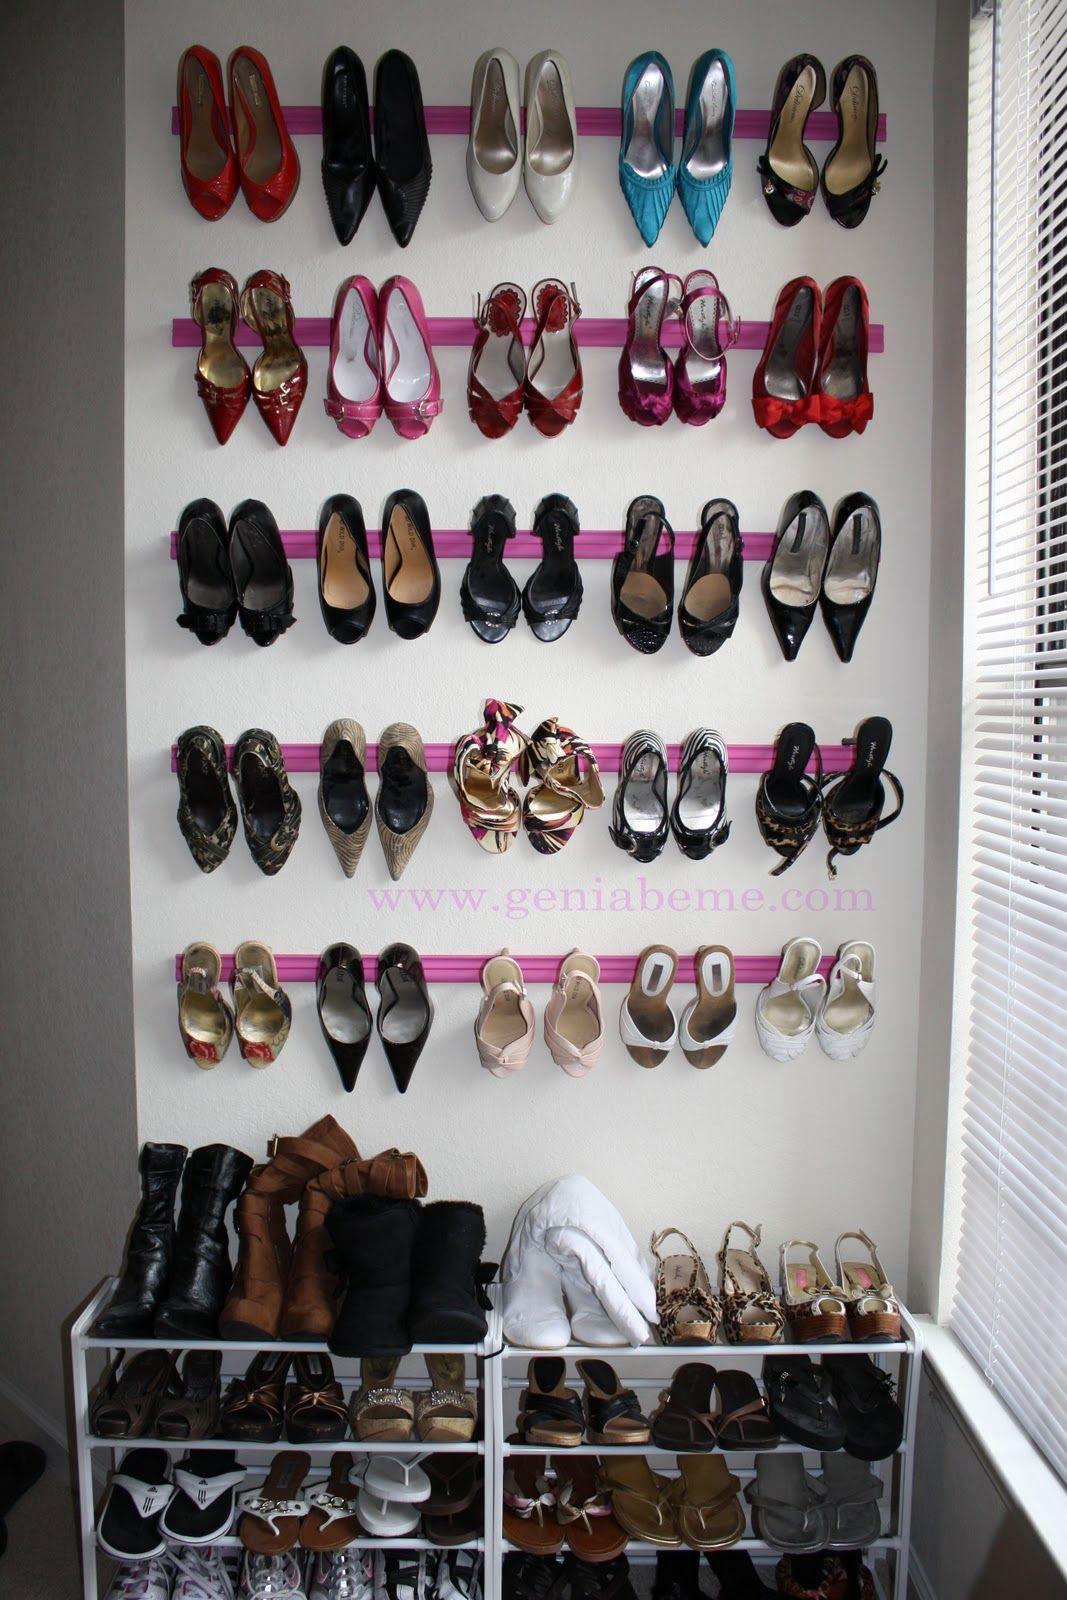 55 Best Shoe Rack Plans Images On Pinterest | Shoe Racks, Diy Shoe Rack And  Shoe Storage